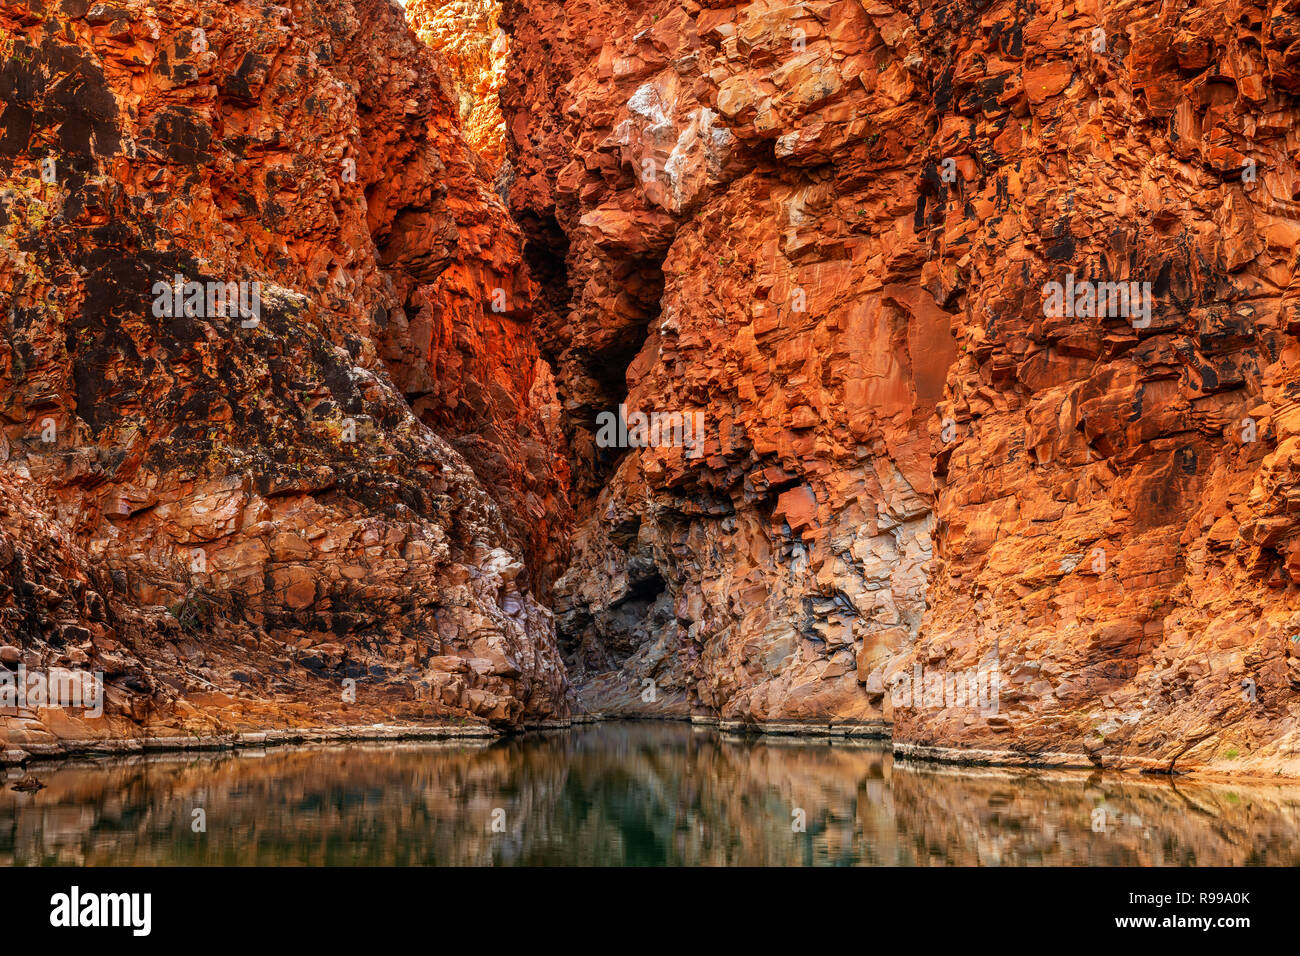 Towering red rock walls in Redbank Gorge. - Stock Image